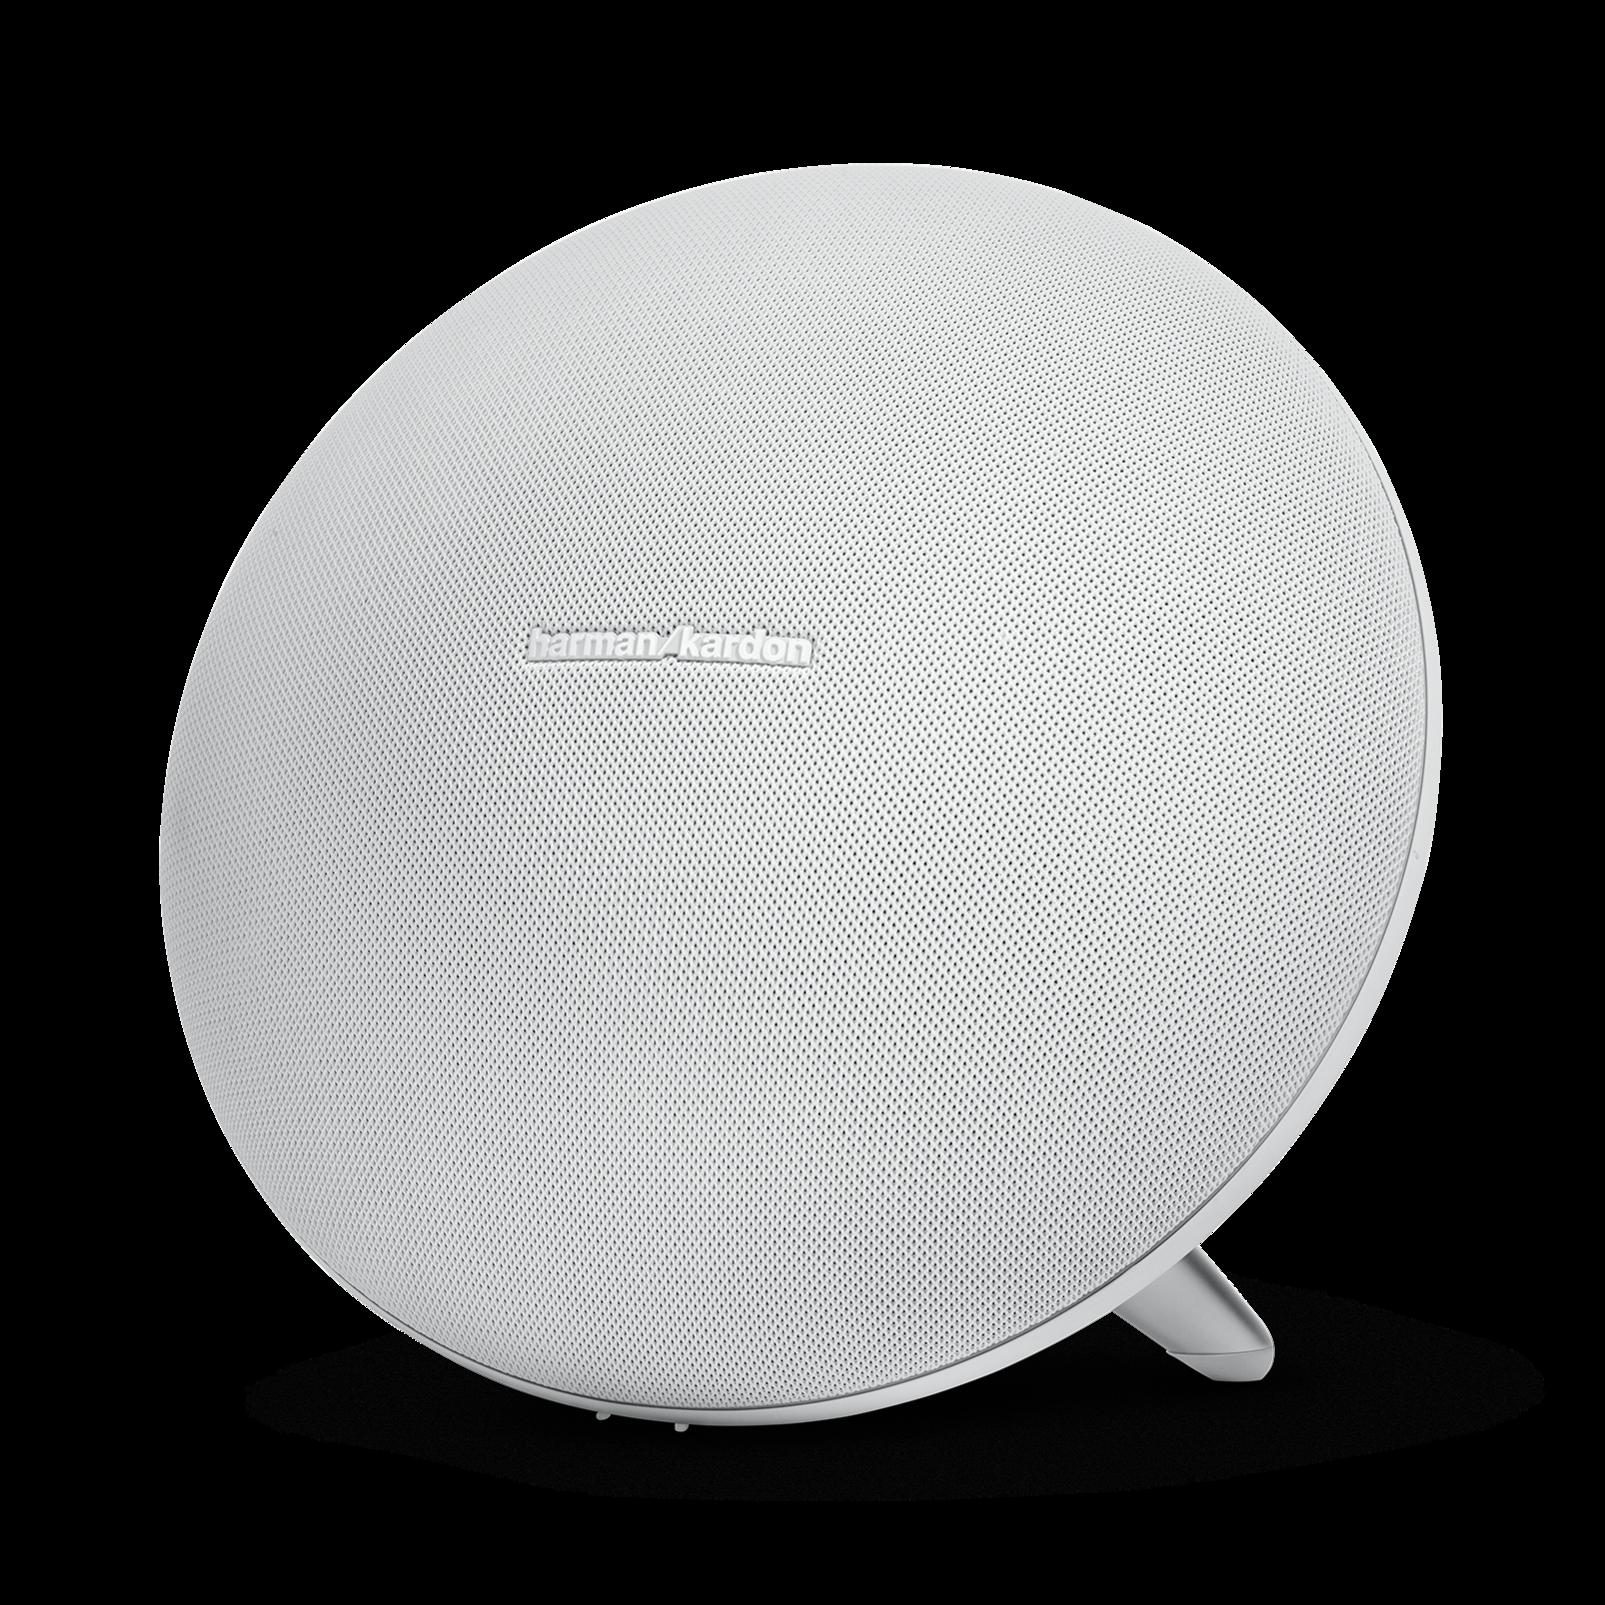 Onyx Studio 3 - White - Portable Bluetooth Speaker - Hero